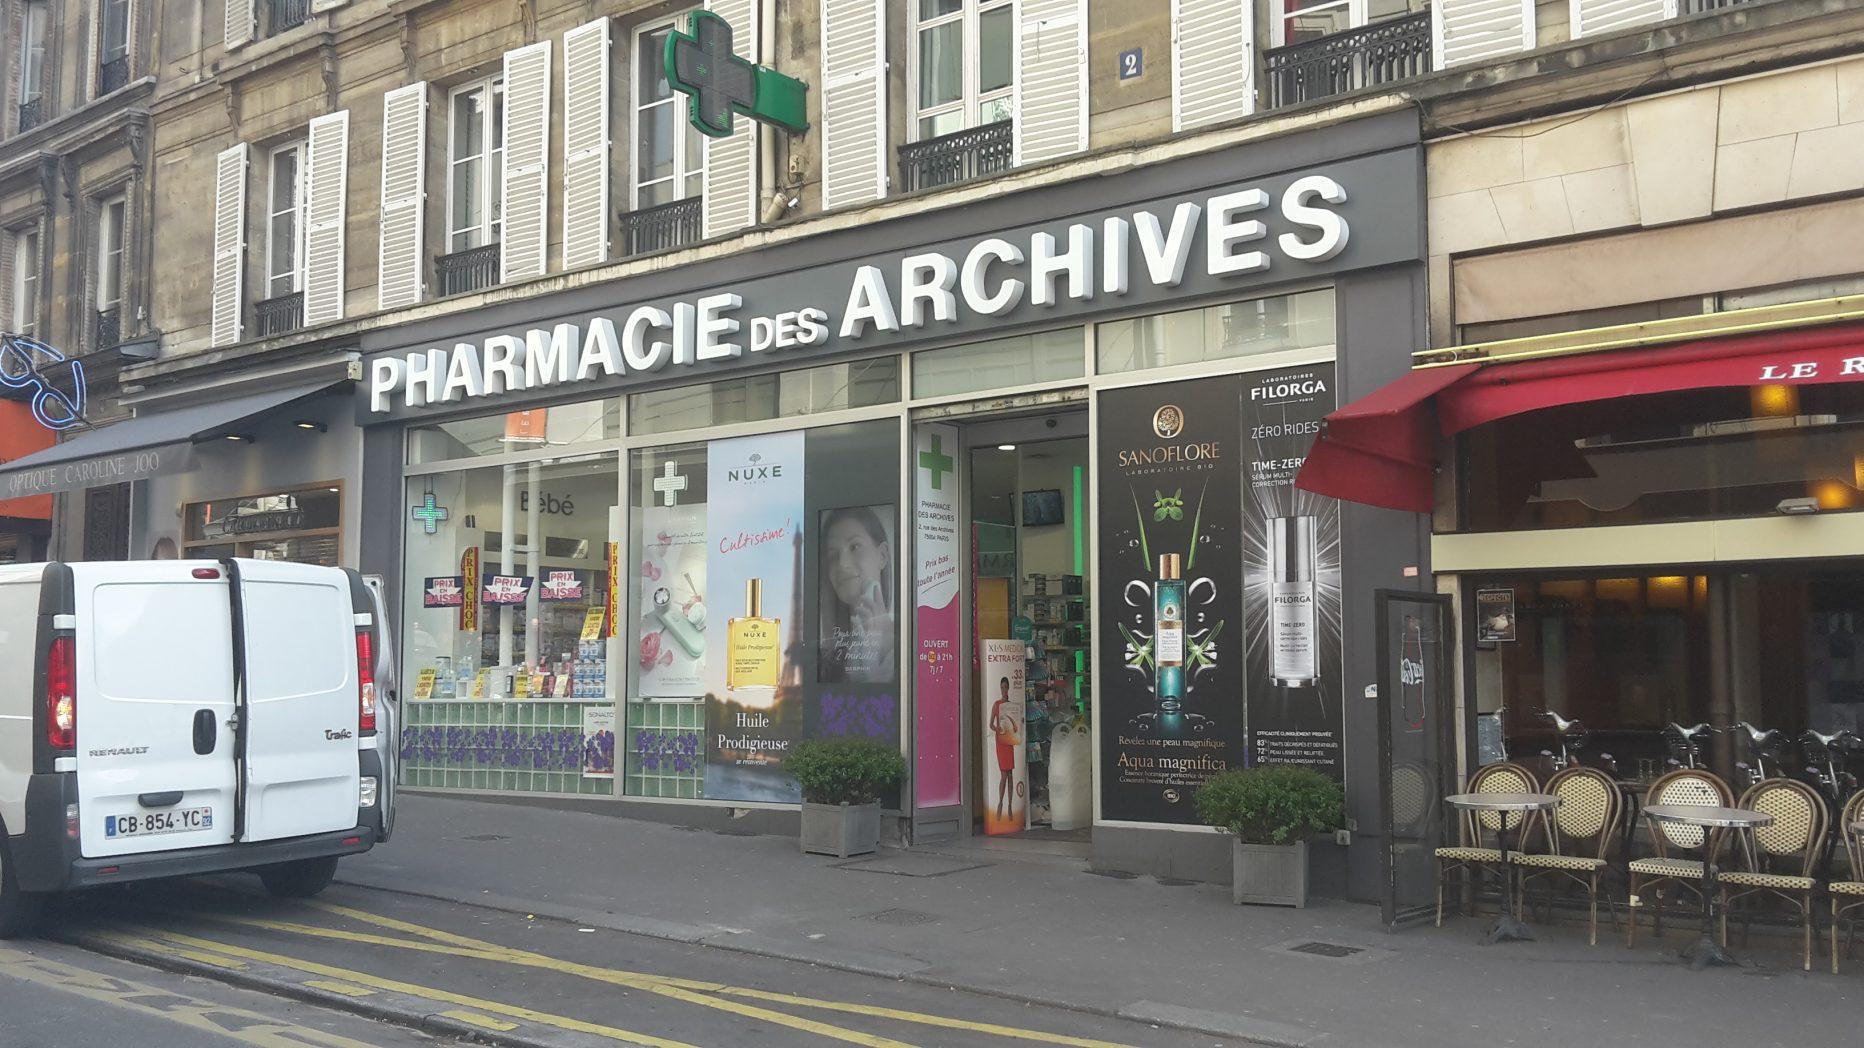 Pharmacie des Archives